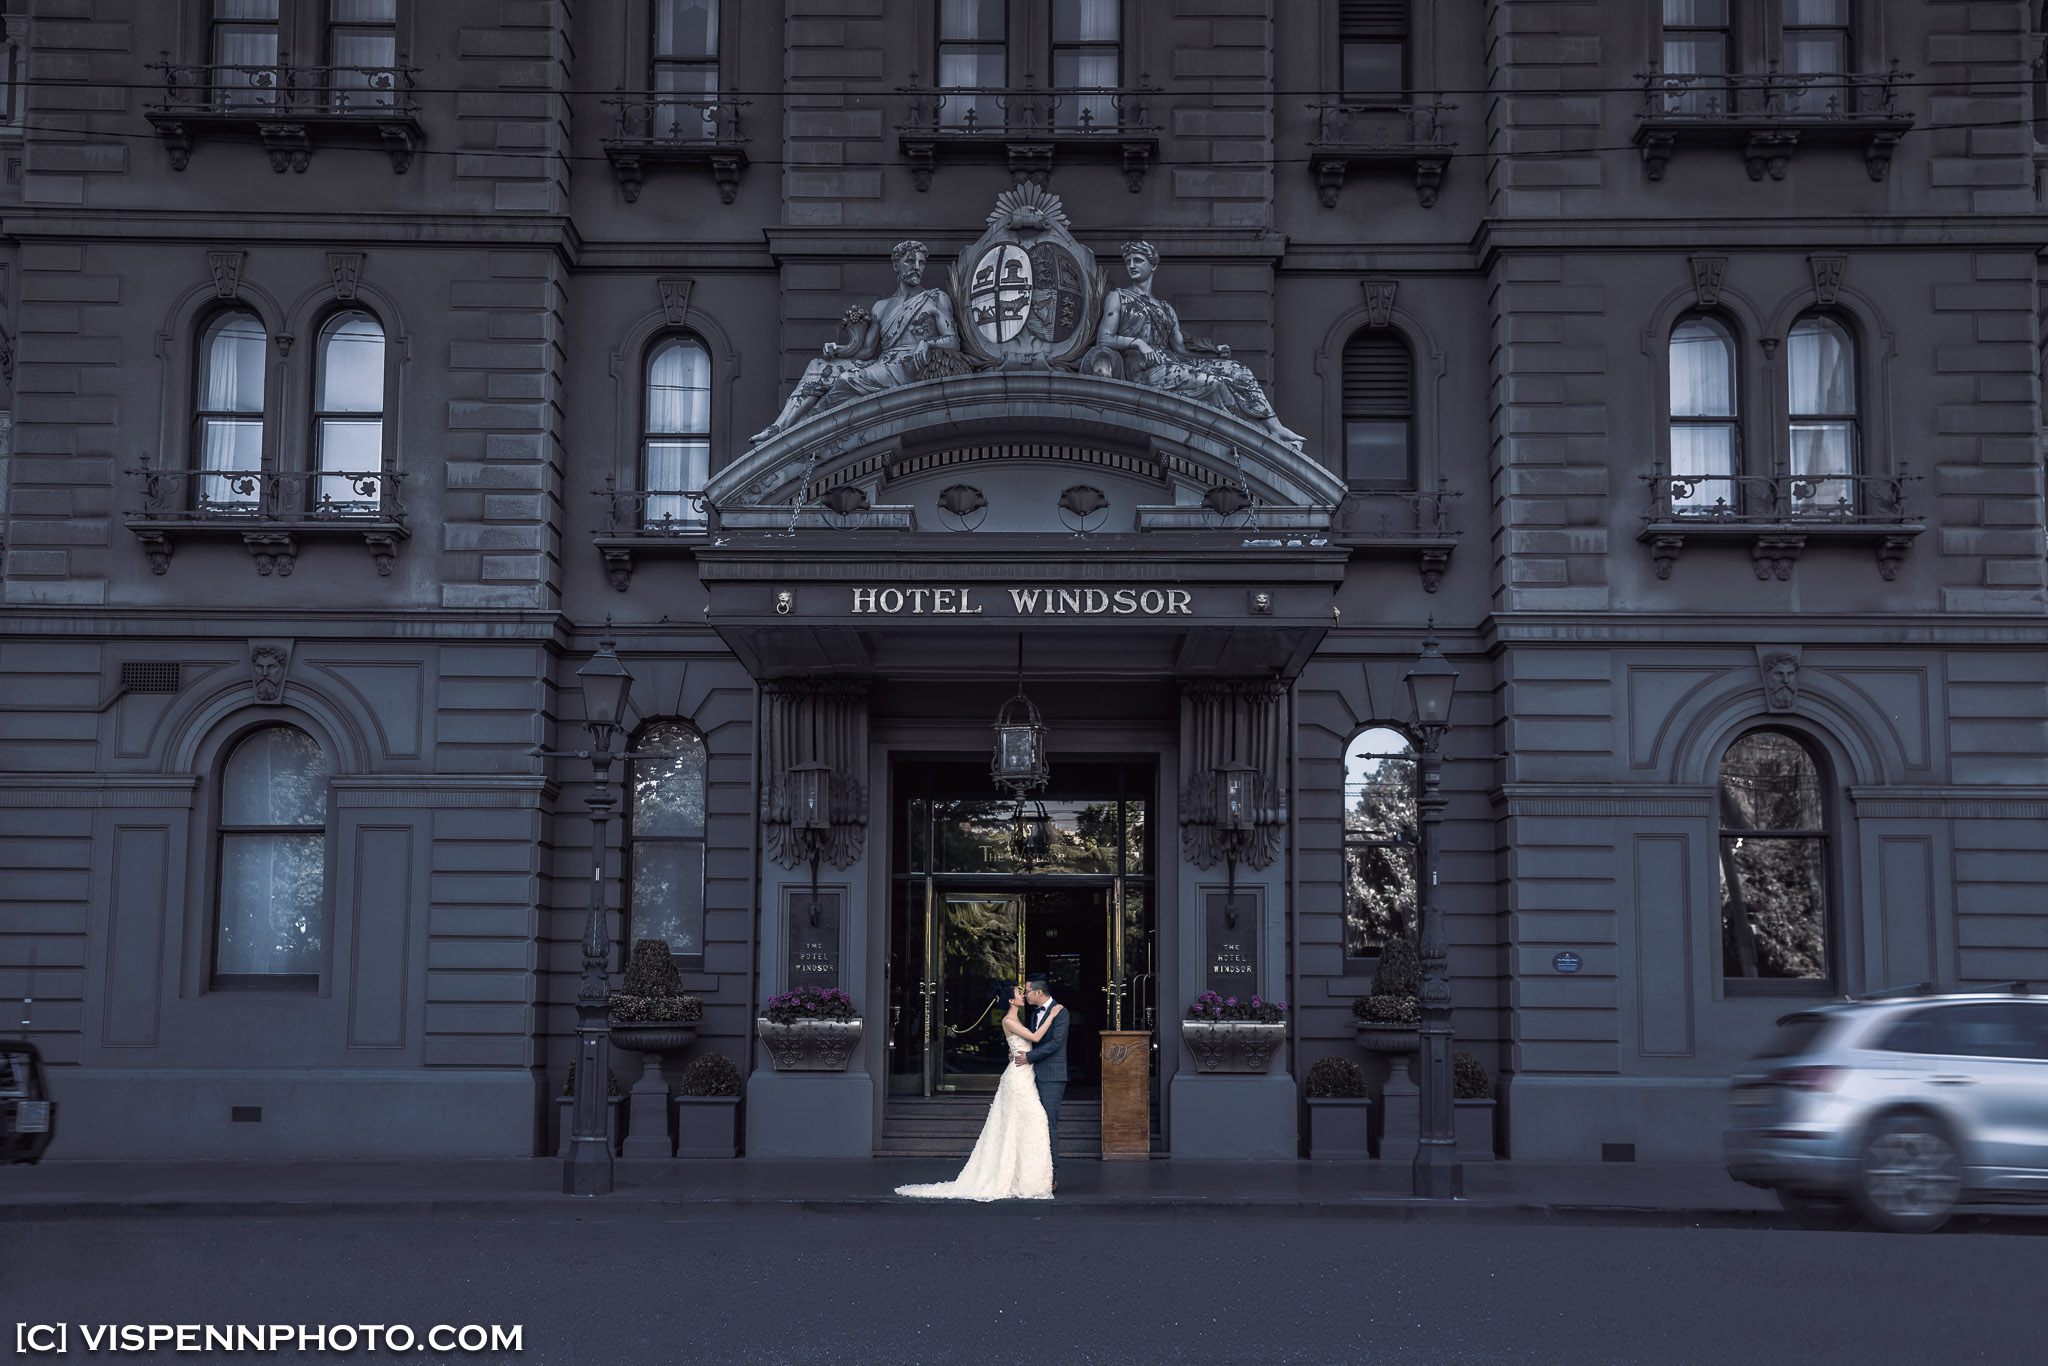 PRE WEDDING Photography Melbourne VISPENN 墨尔本 婚纱照 结婚照 婚纱摄影 VISPENN AmandaXing 1P A7R2 2509